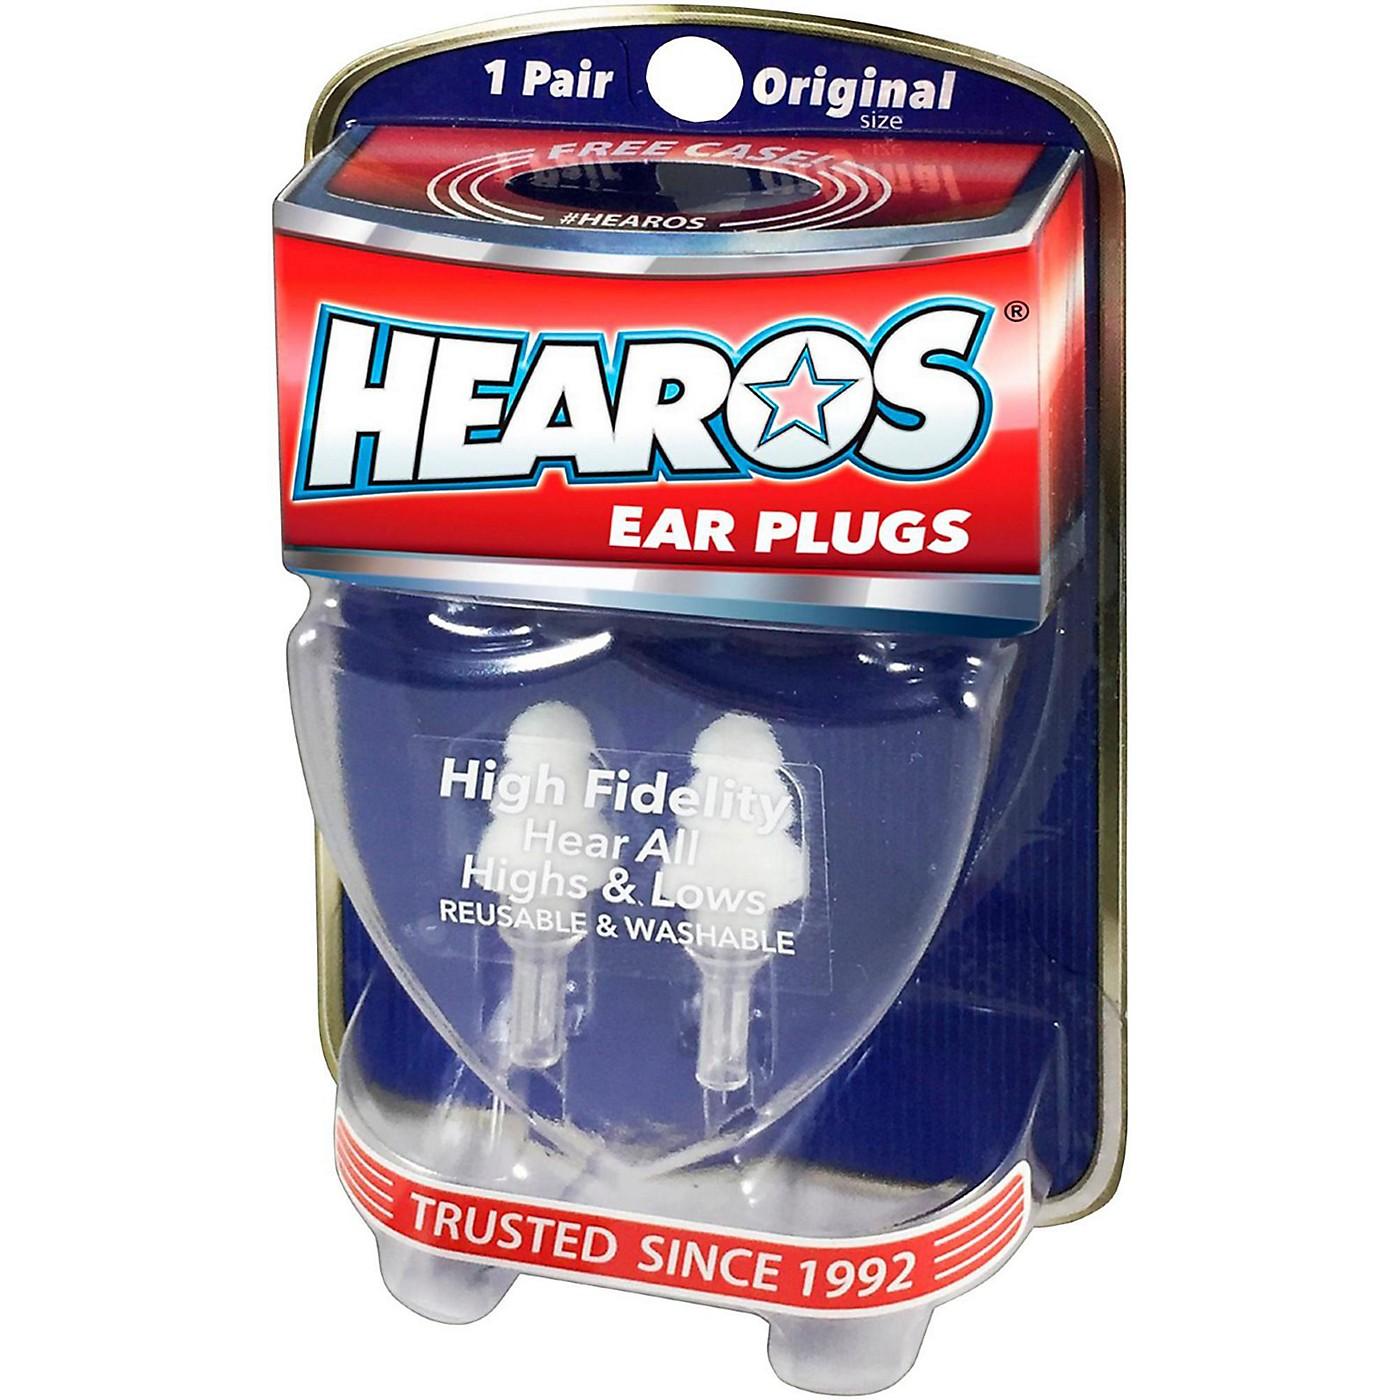 Hearos High Fidelity Ear Plugs thumbnail